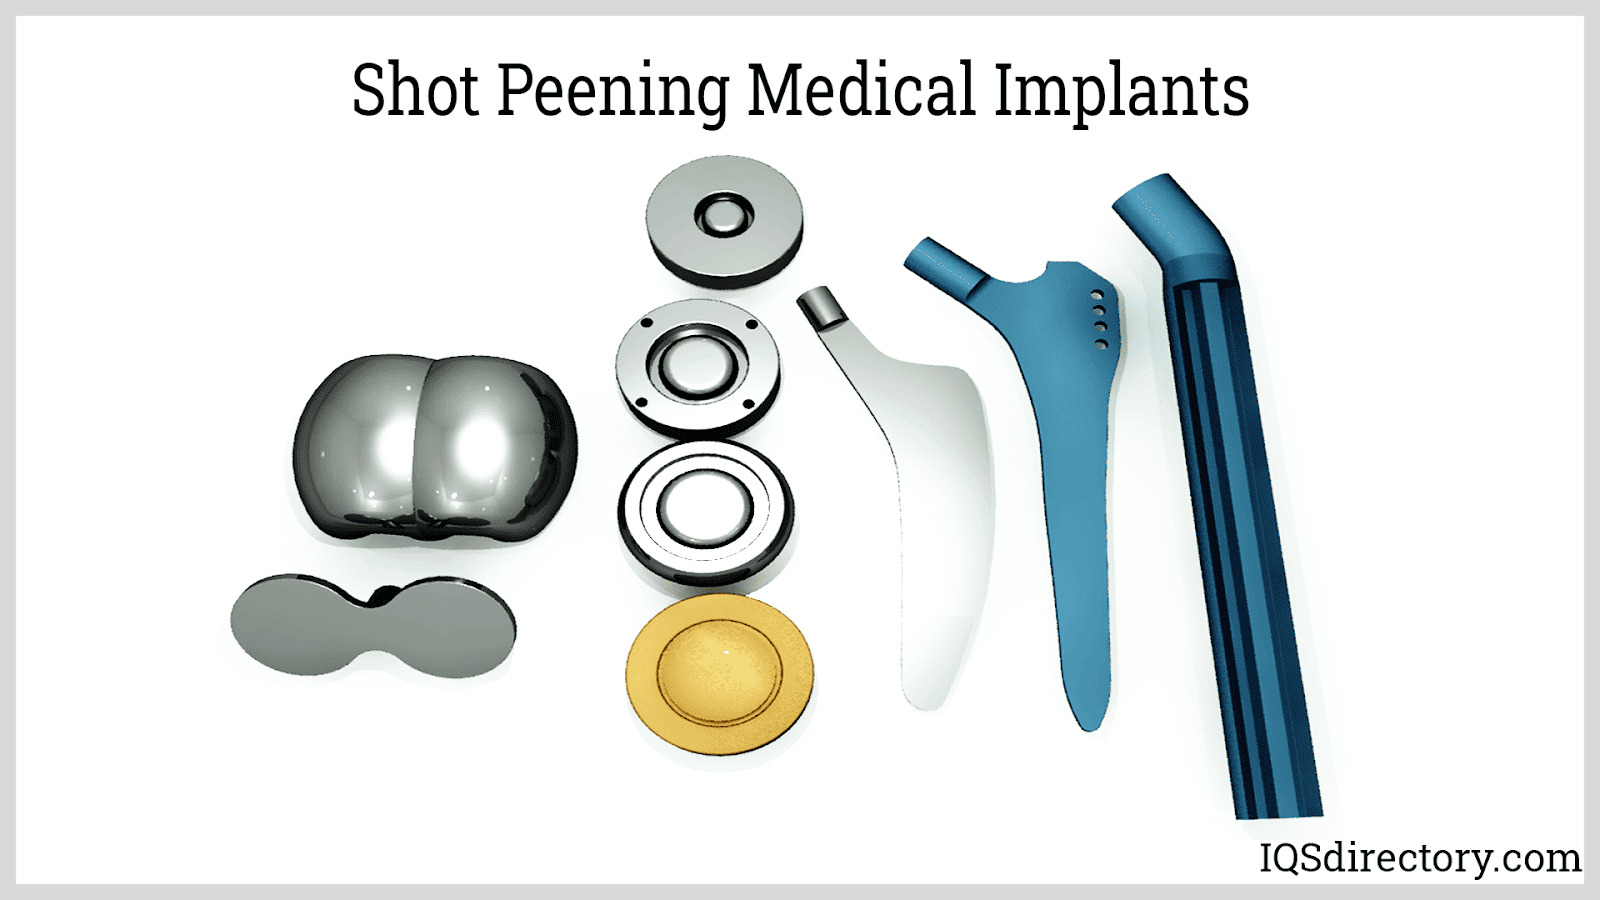 Shot Peening Medical Implants